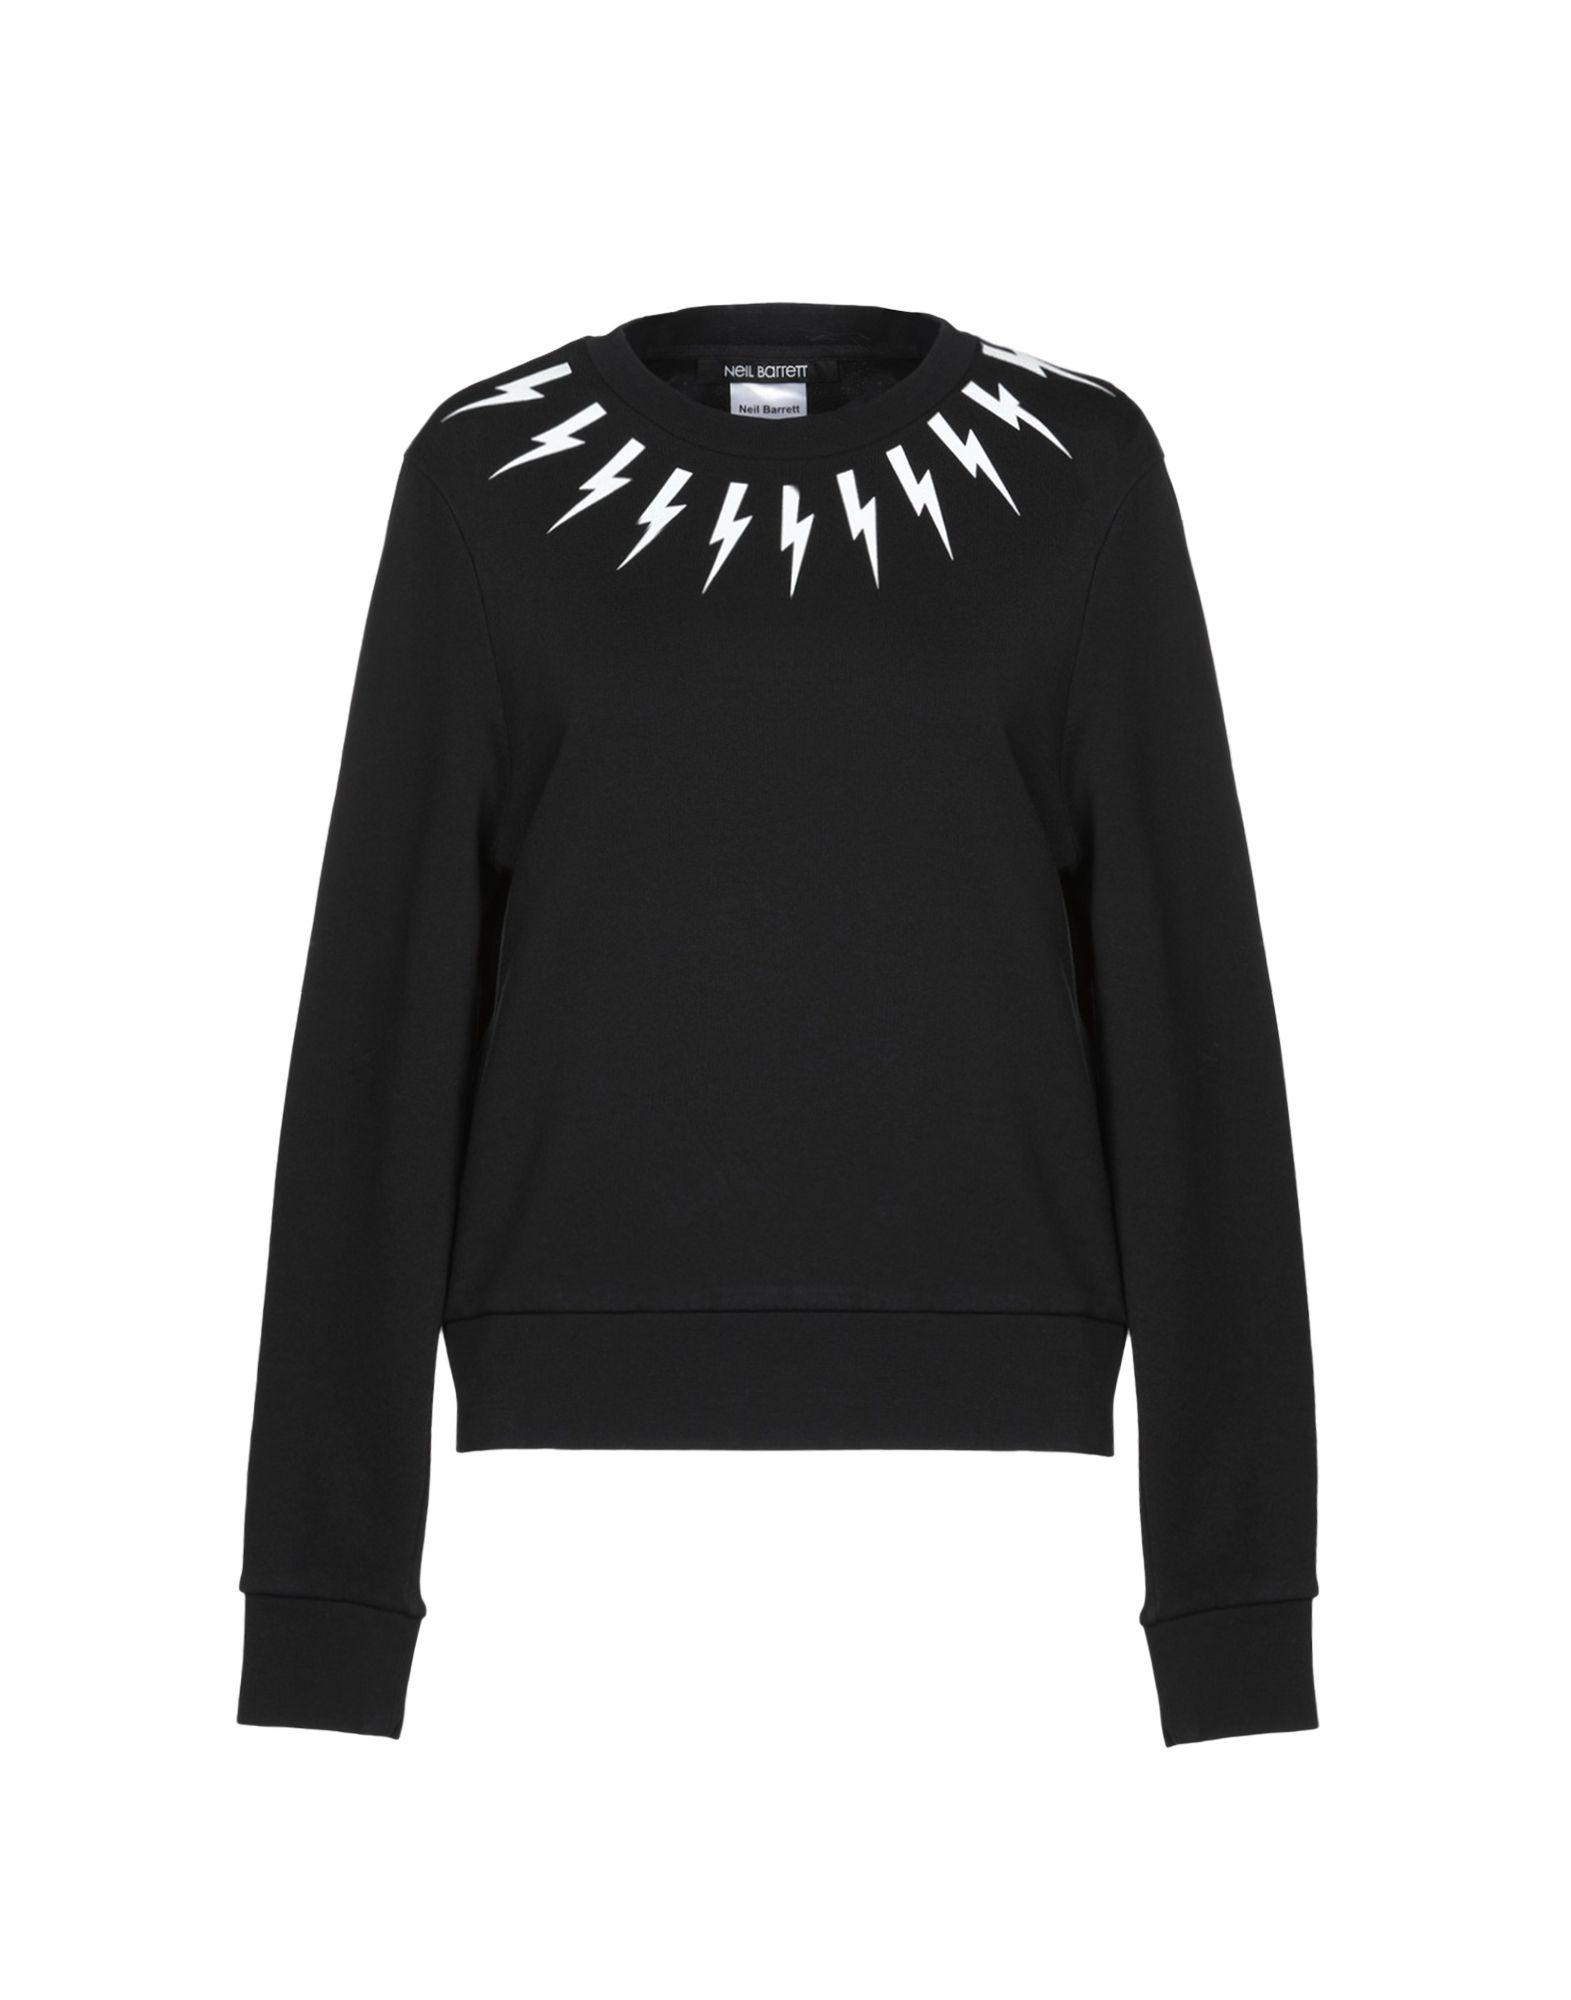 b1bf260e6ee Neil Barrett Sweatshirt - Women Neil Barrett Sweatshirts online on YOOX  United States - 12222408CM